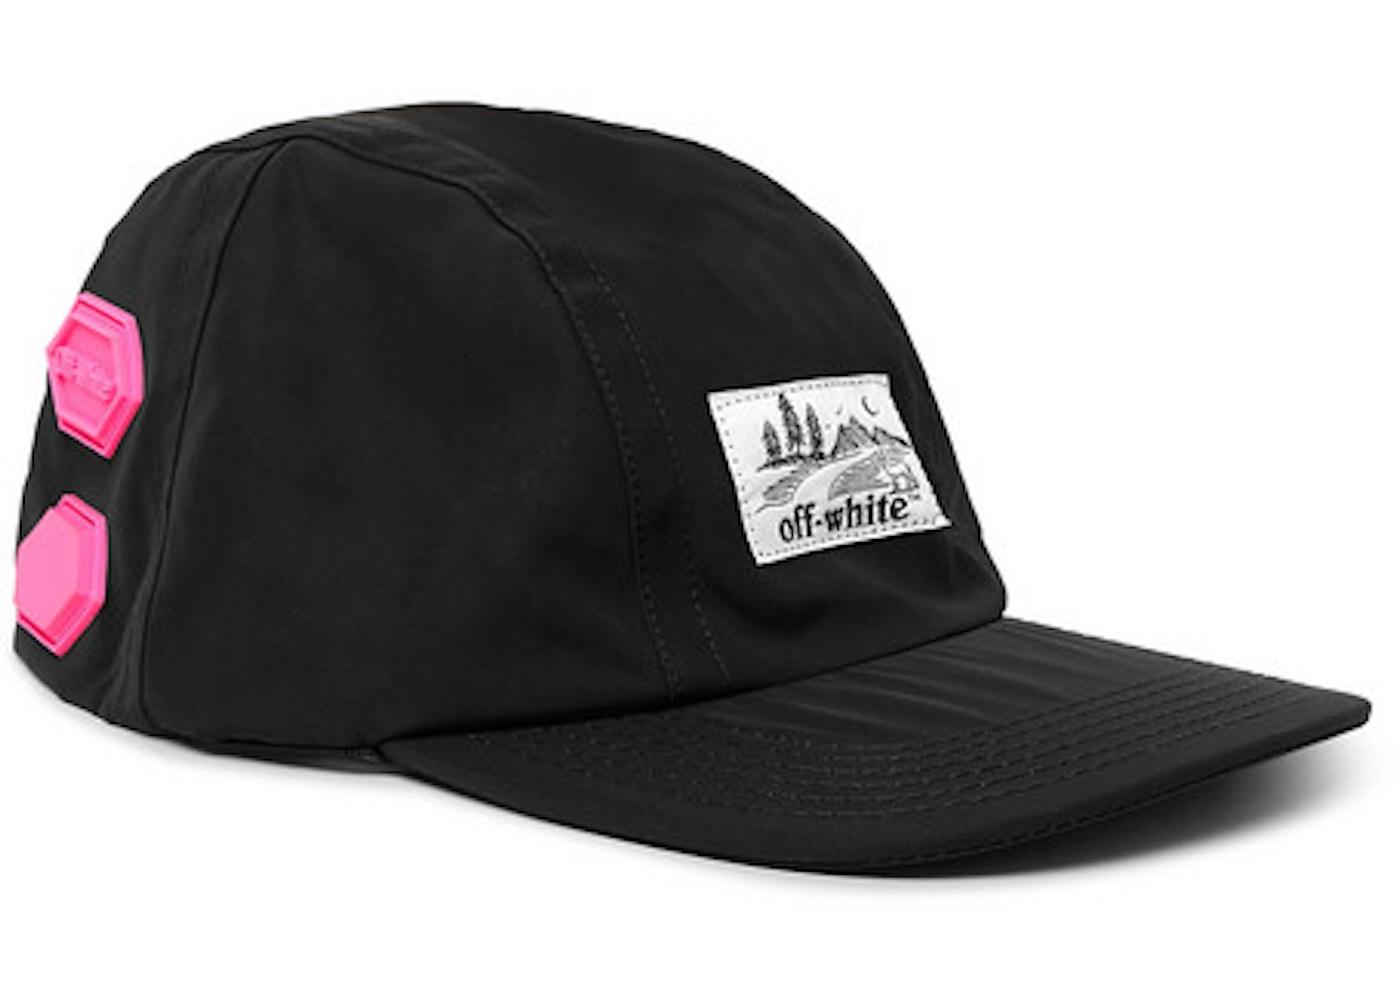 9c34f8f86 OFF-WHITE Logo Appliqued Shell Baseball Hat Black/Pink